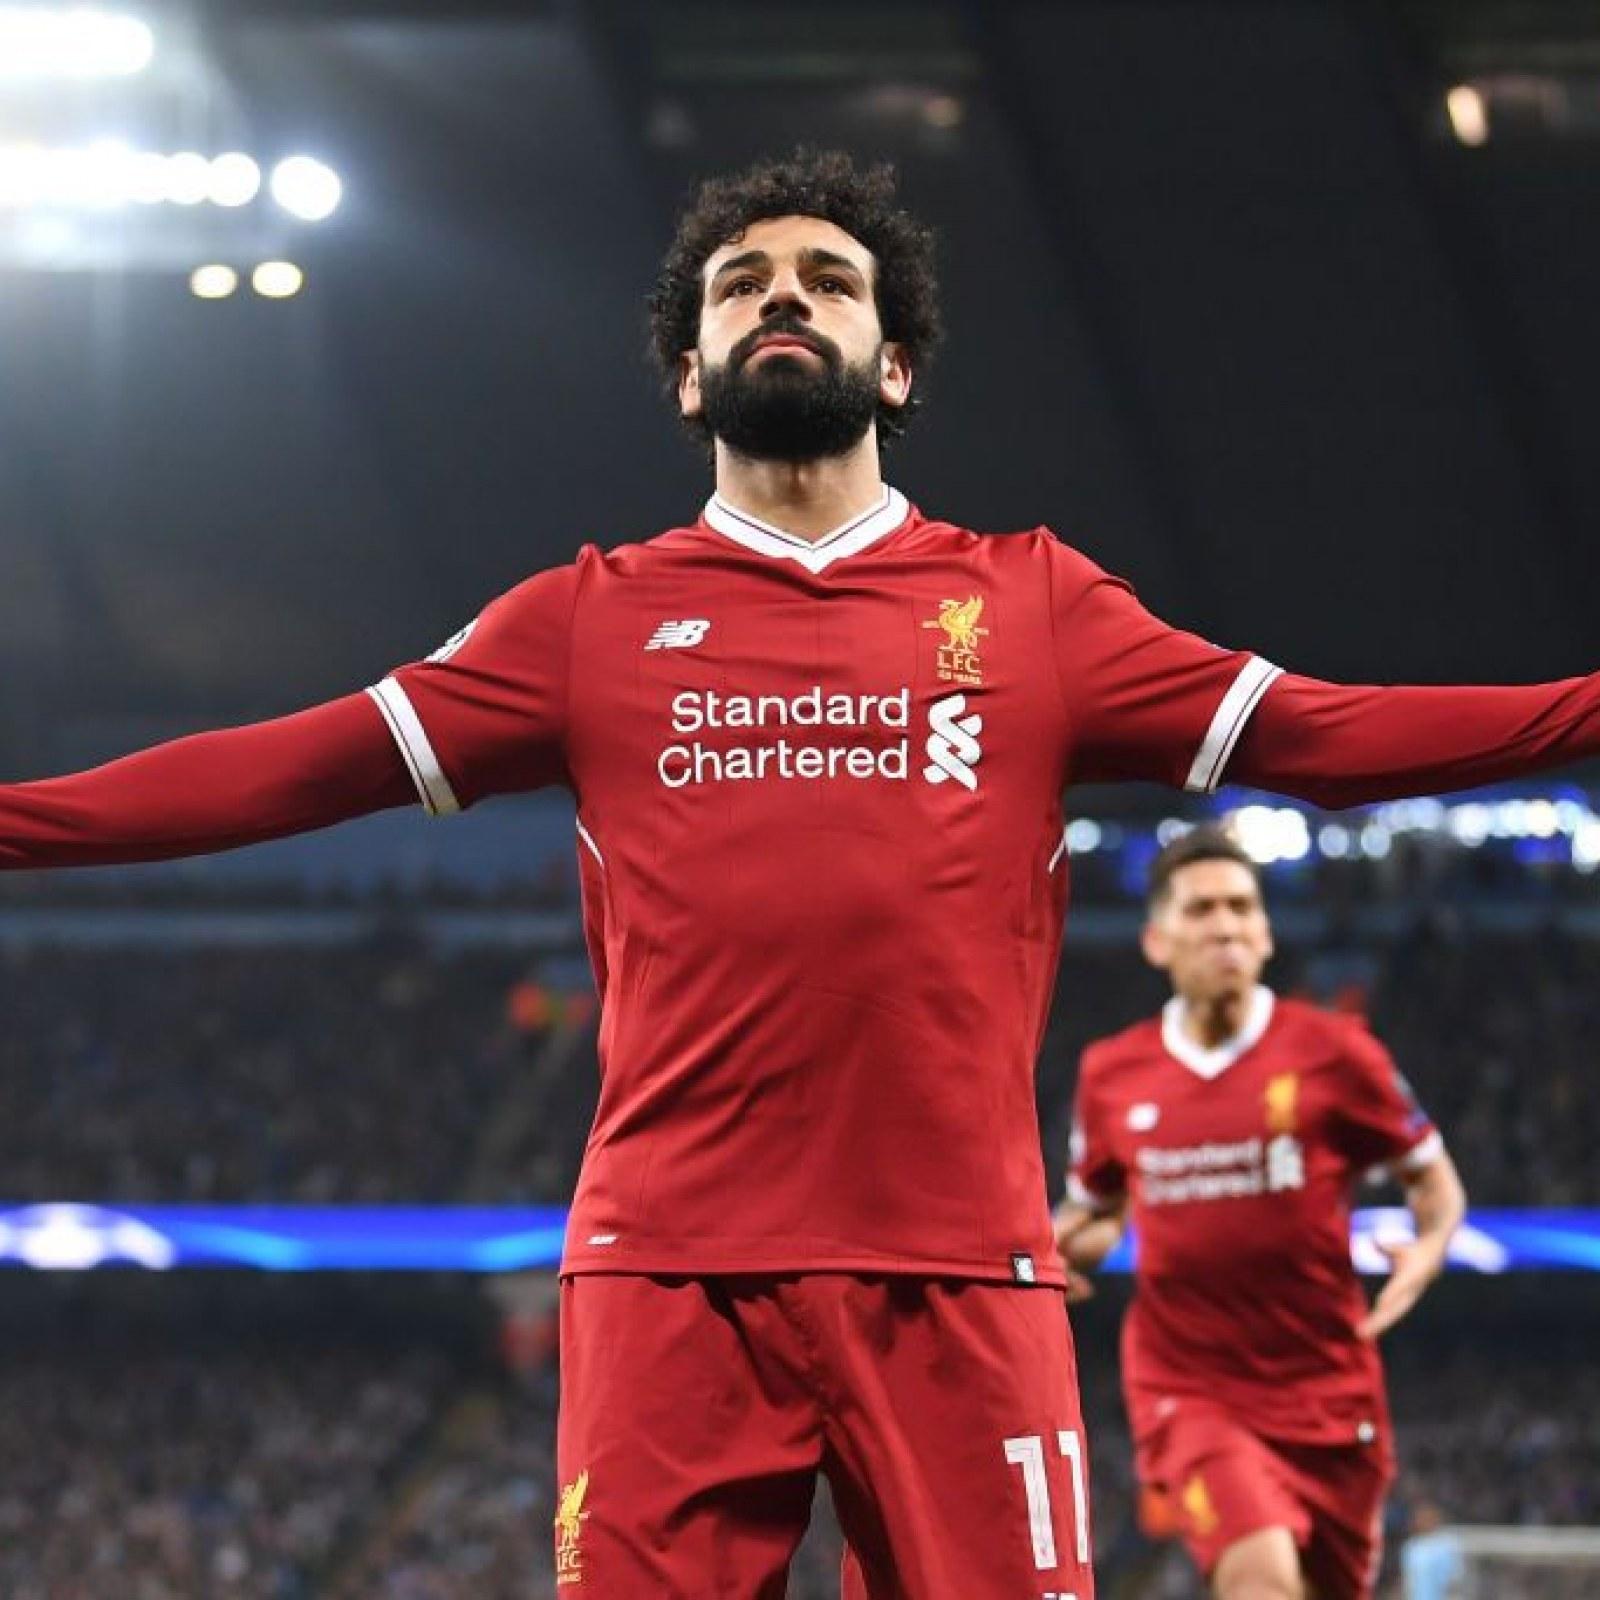 b5e1e9553cd Transfer News: Liverpool Respond to Mohamed Salah Rumors, Real Madrid  Star's Future in Doubt